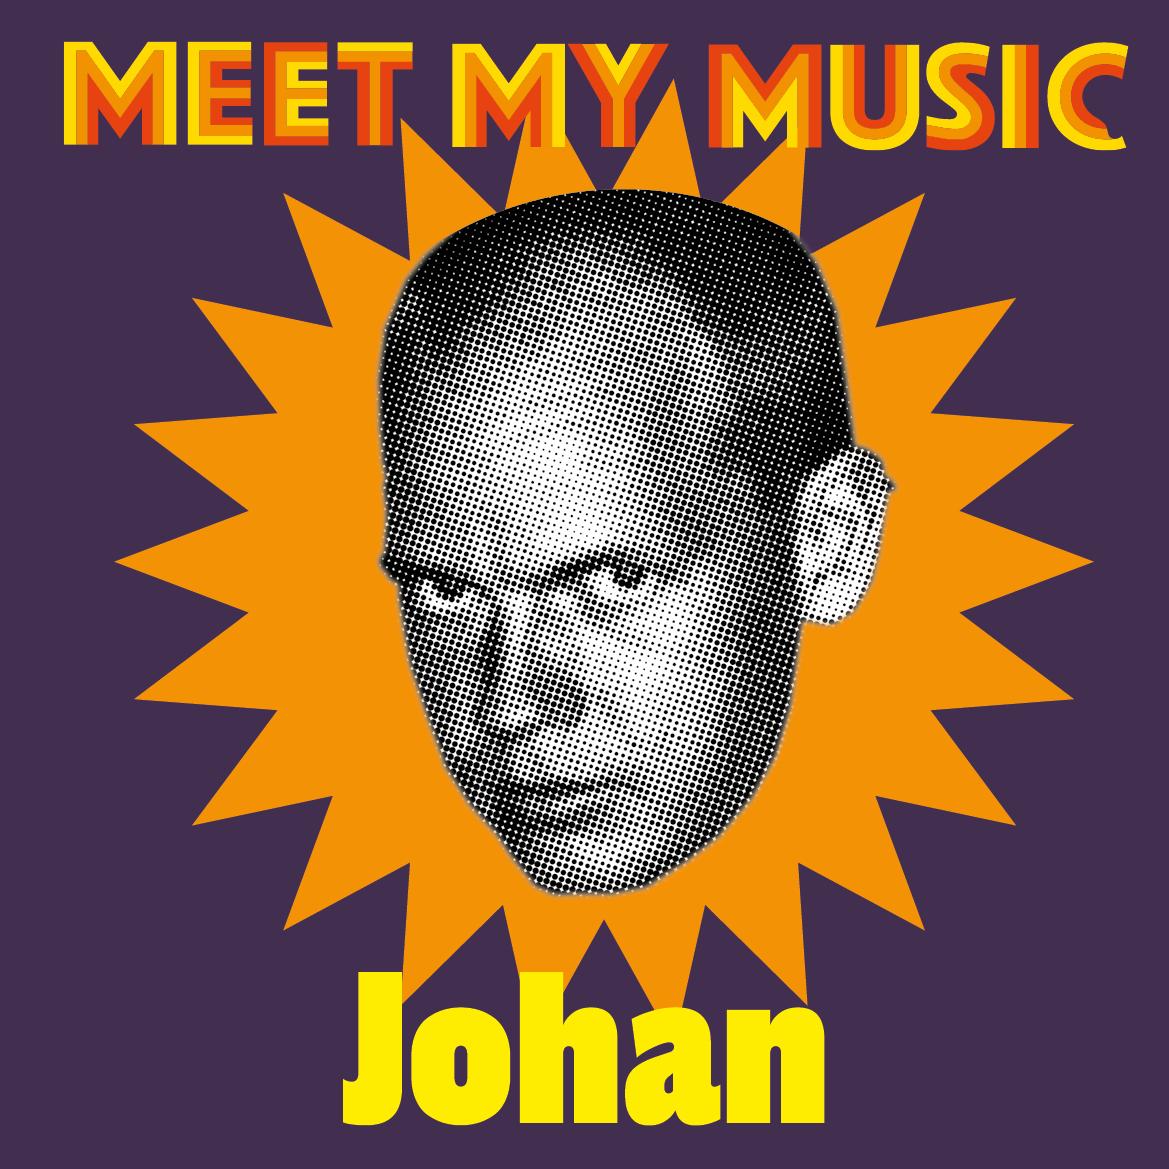 Meet my music Johan.jpg